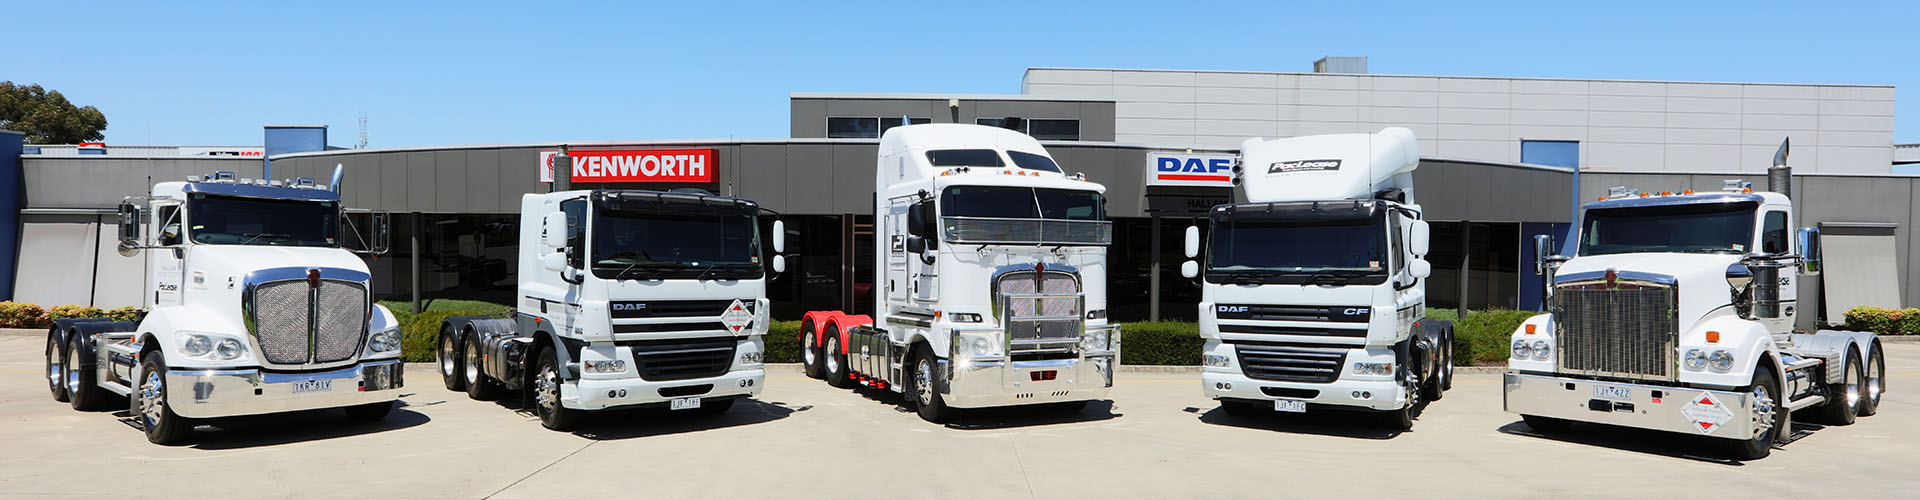 Rental Truck Options